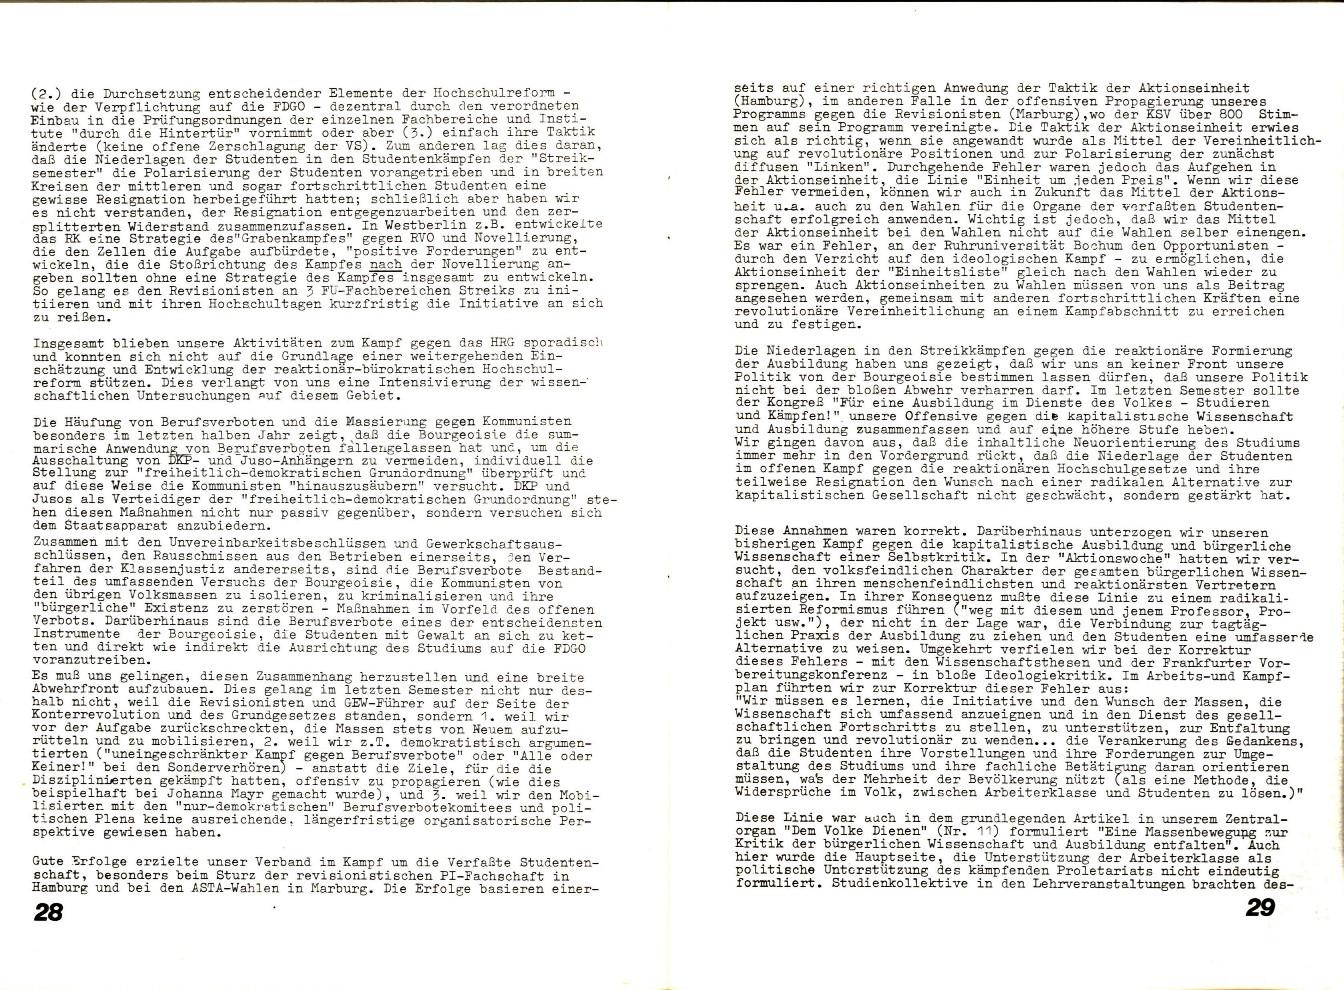 KSV_1974_Rechenschaftsbericht_16